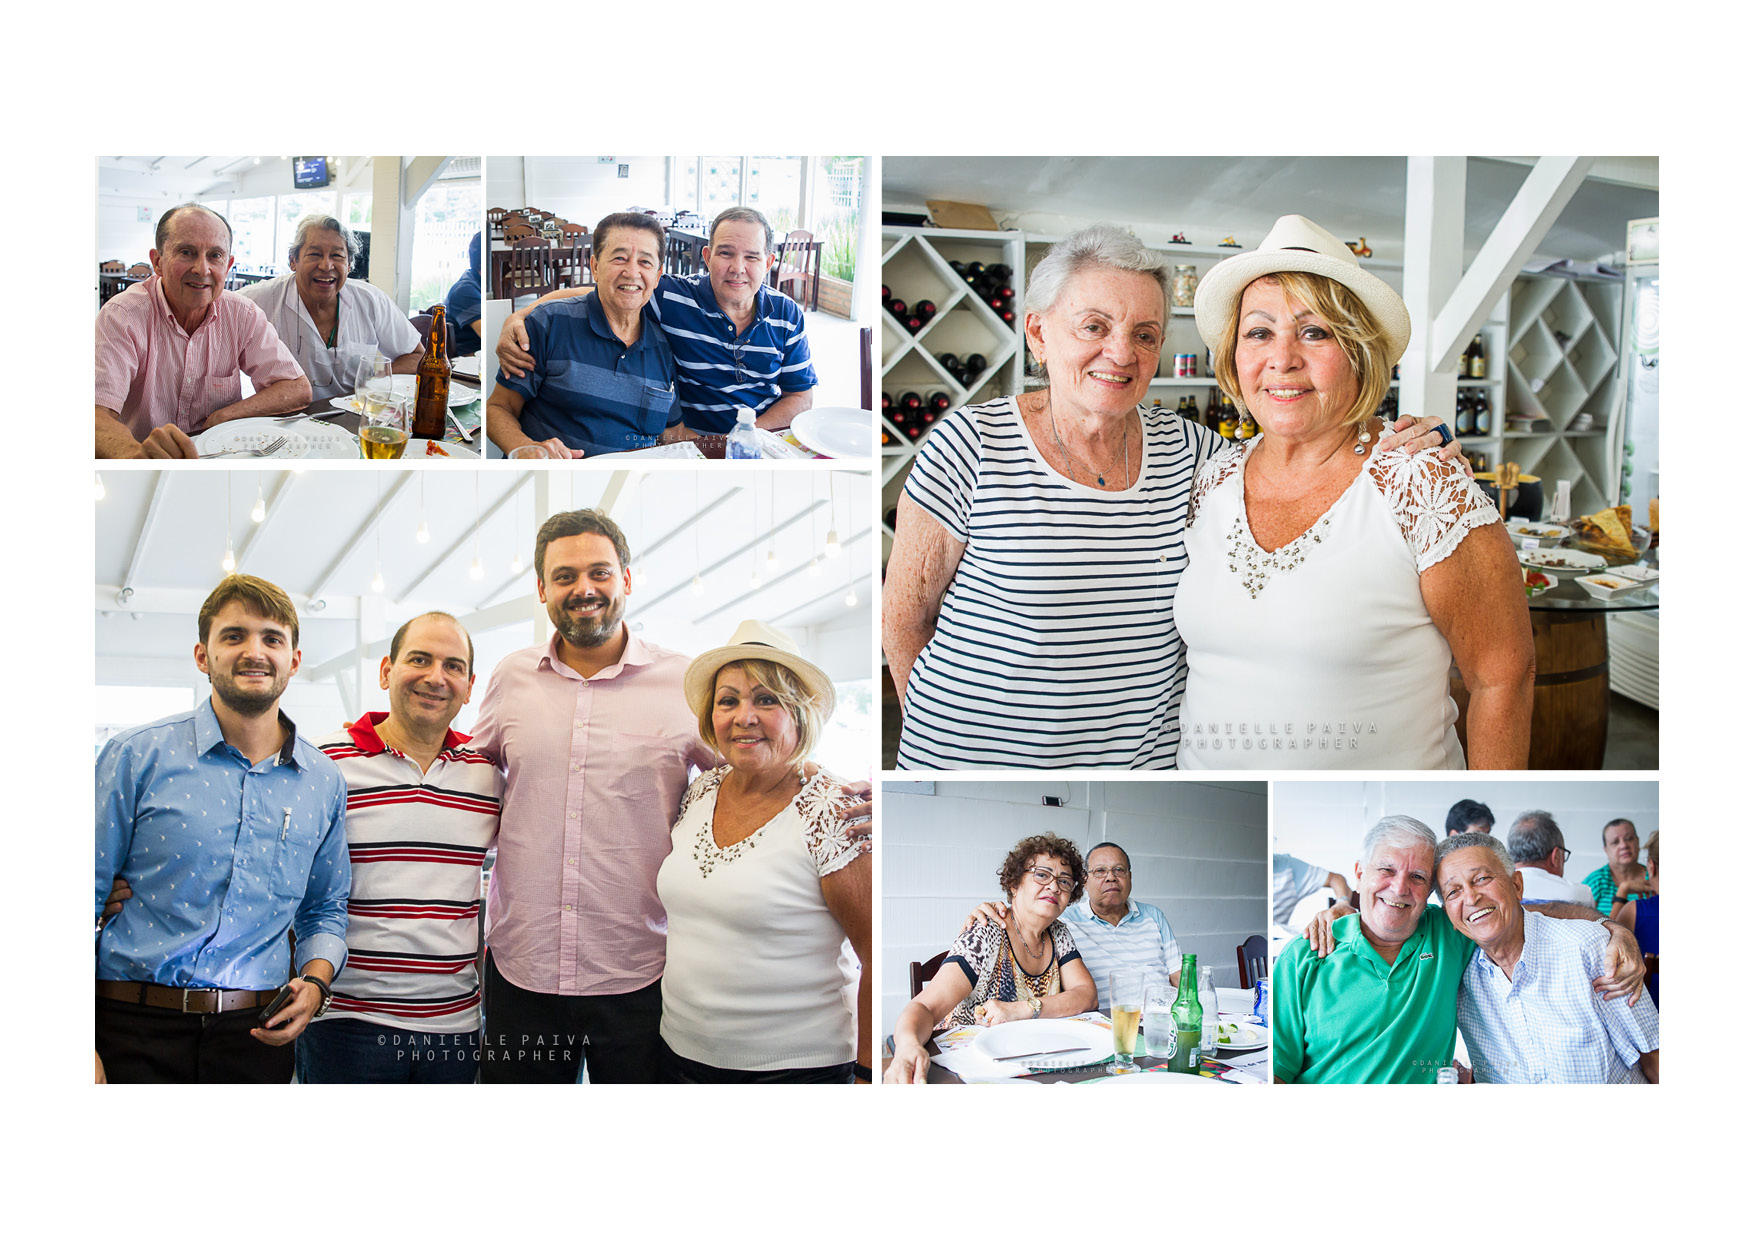 festa-niteroi-restaurante-eventos-tra-i-gusti-3